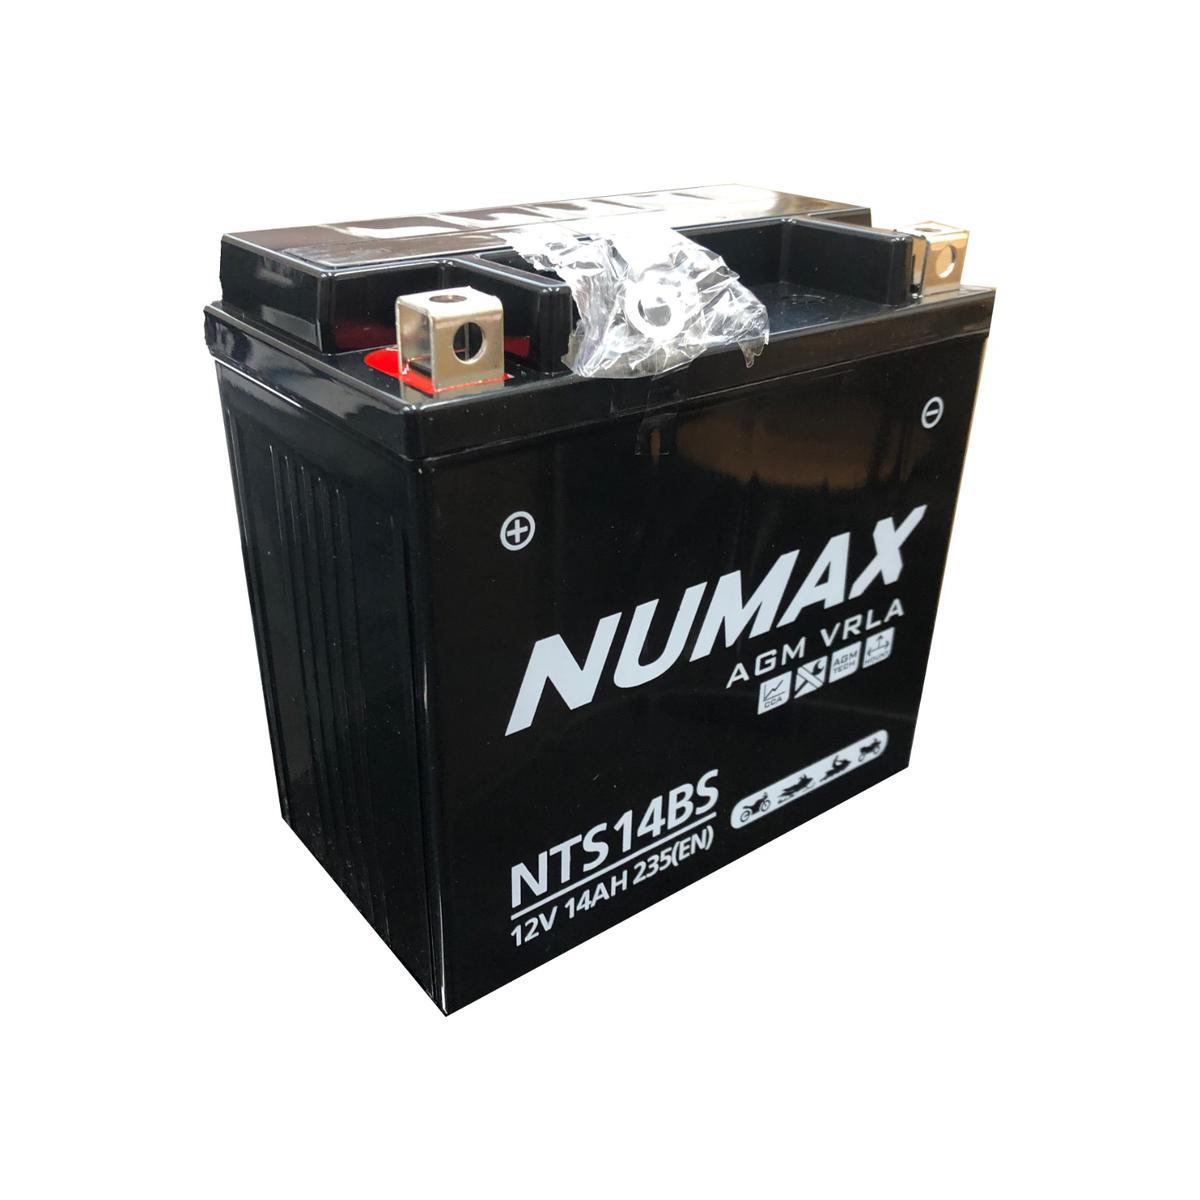 Numax NTS14BS 12v Motorbike Bike Battery KAWASAKI 650cc W650 YTX14-4